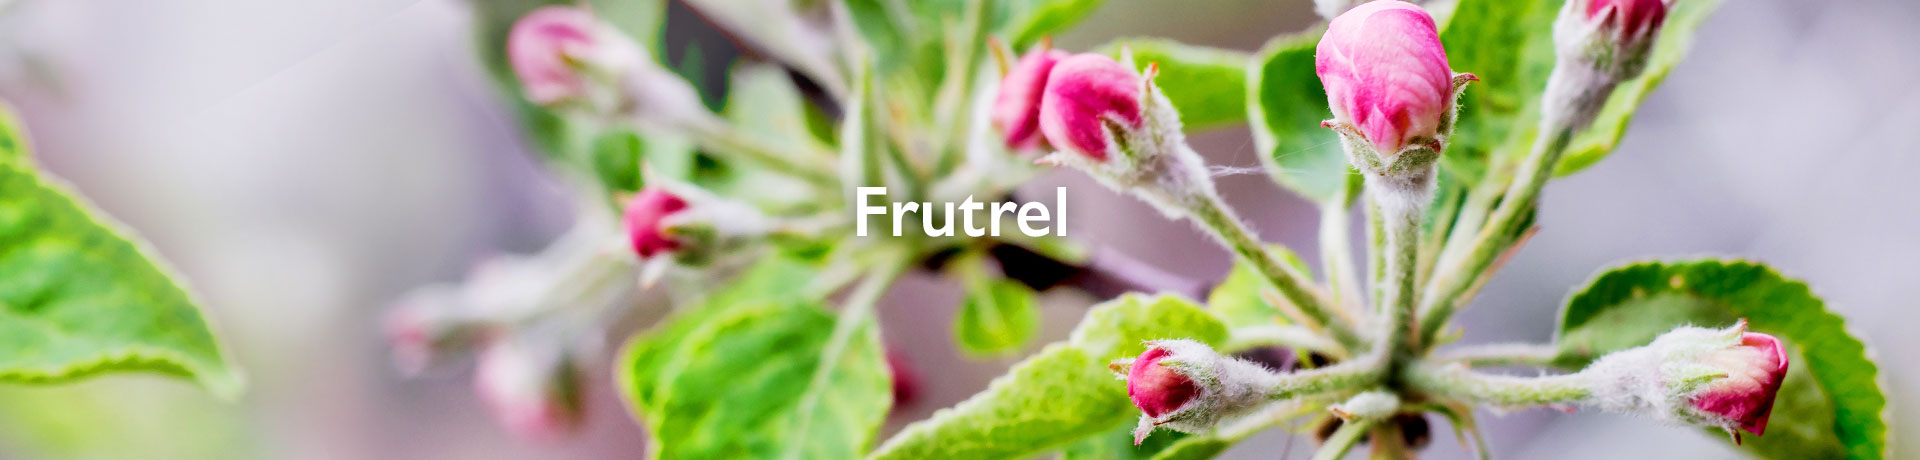 frutrel